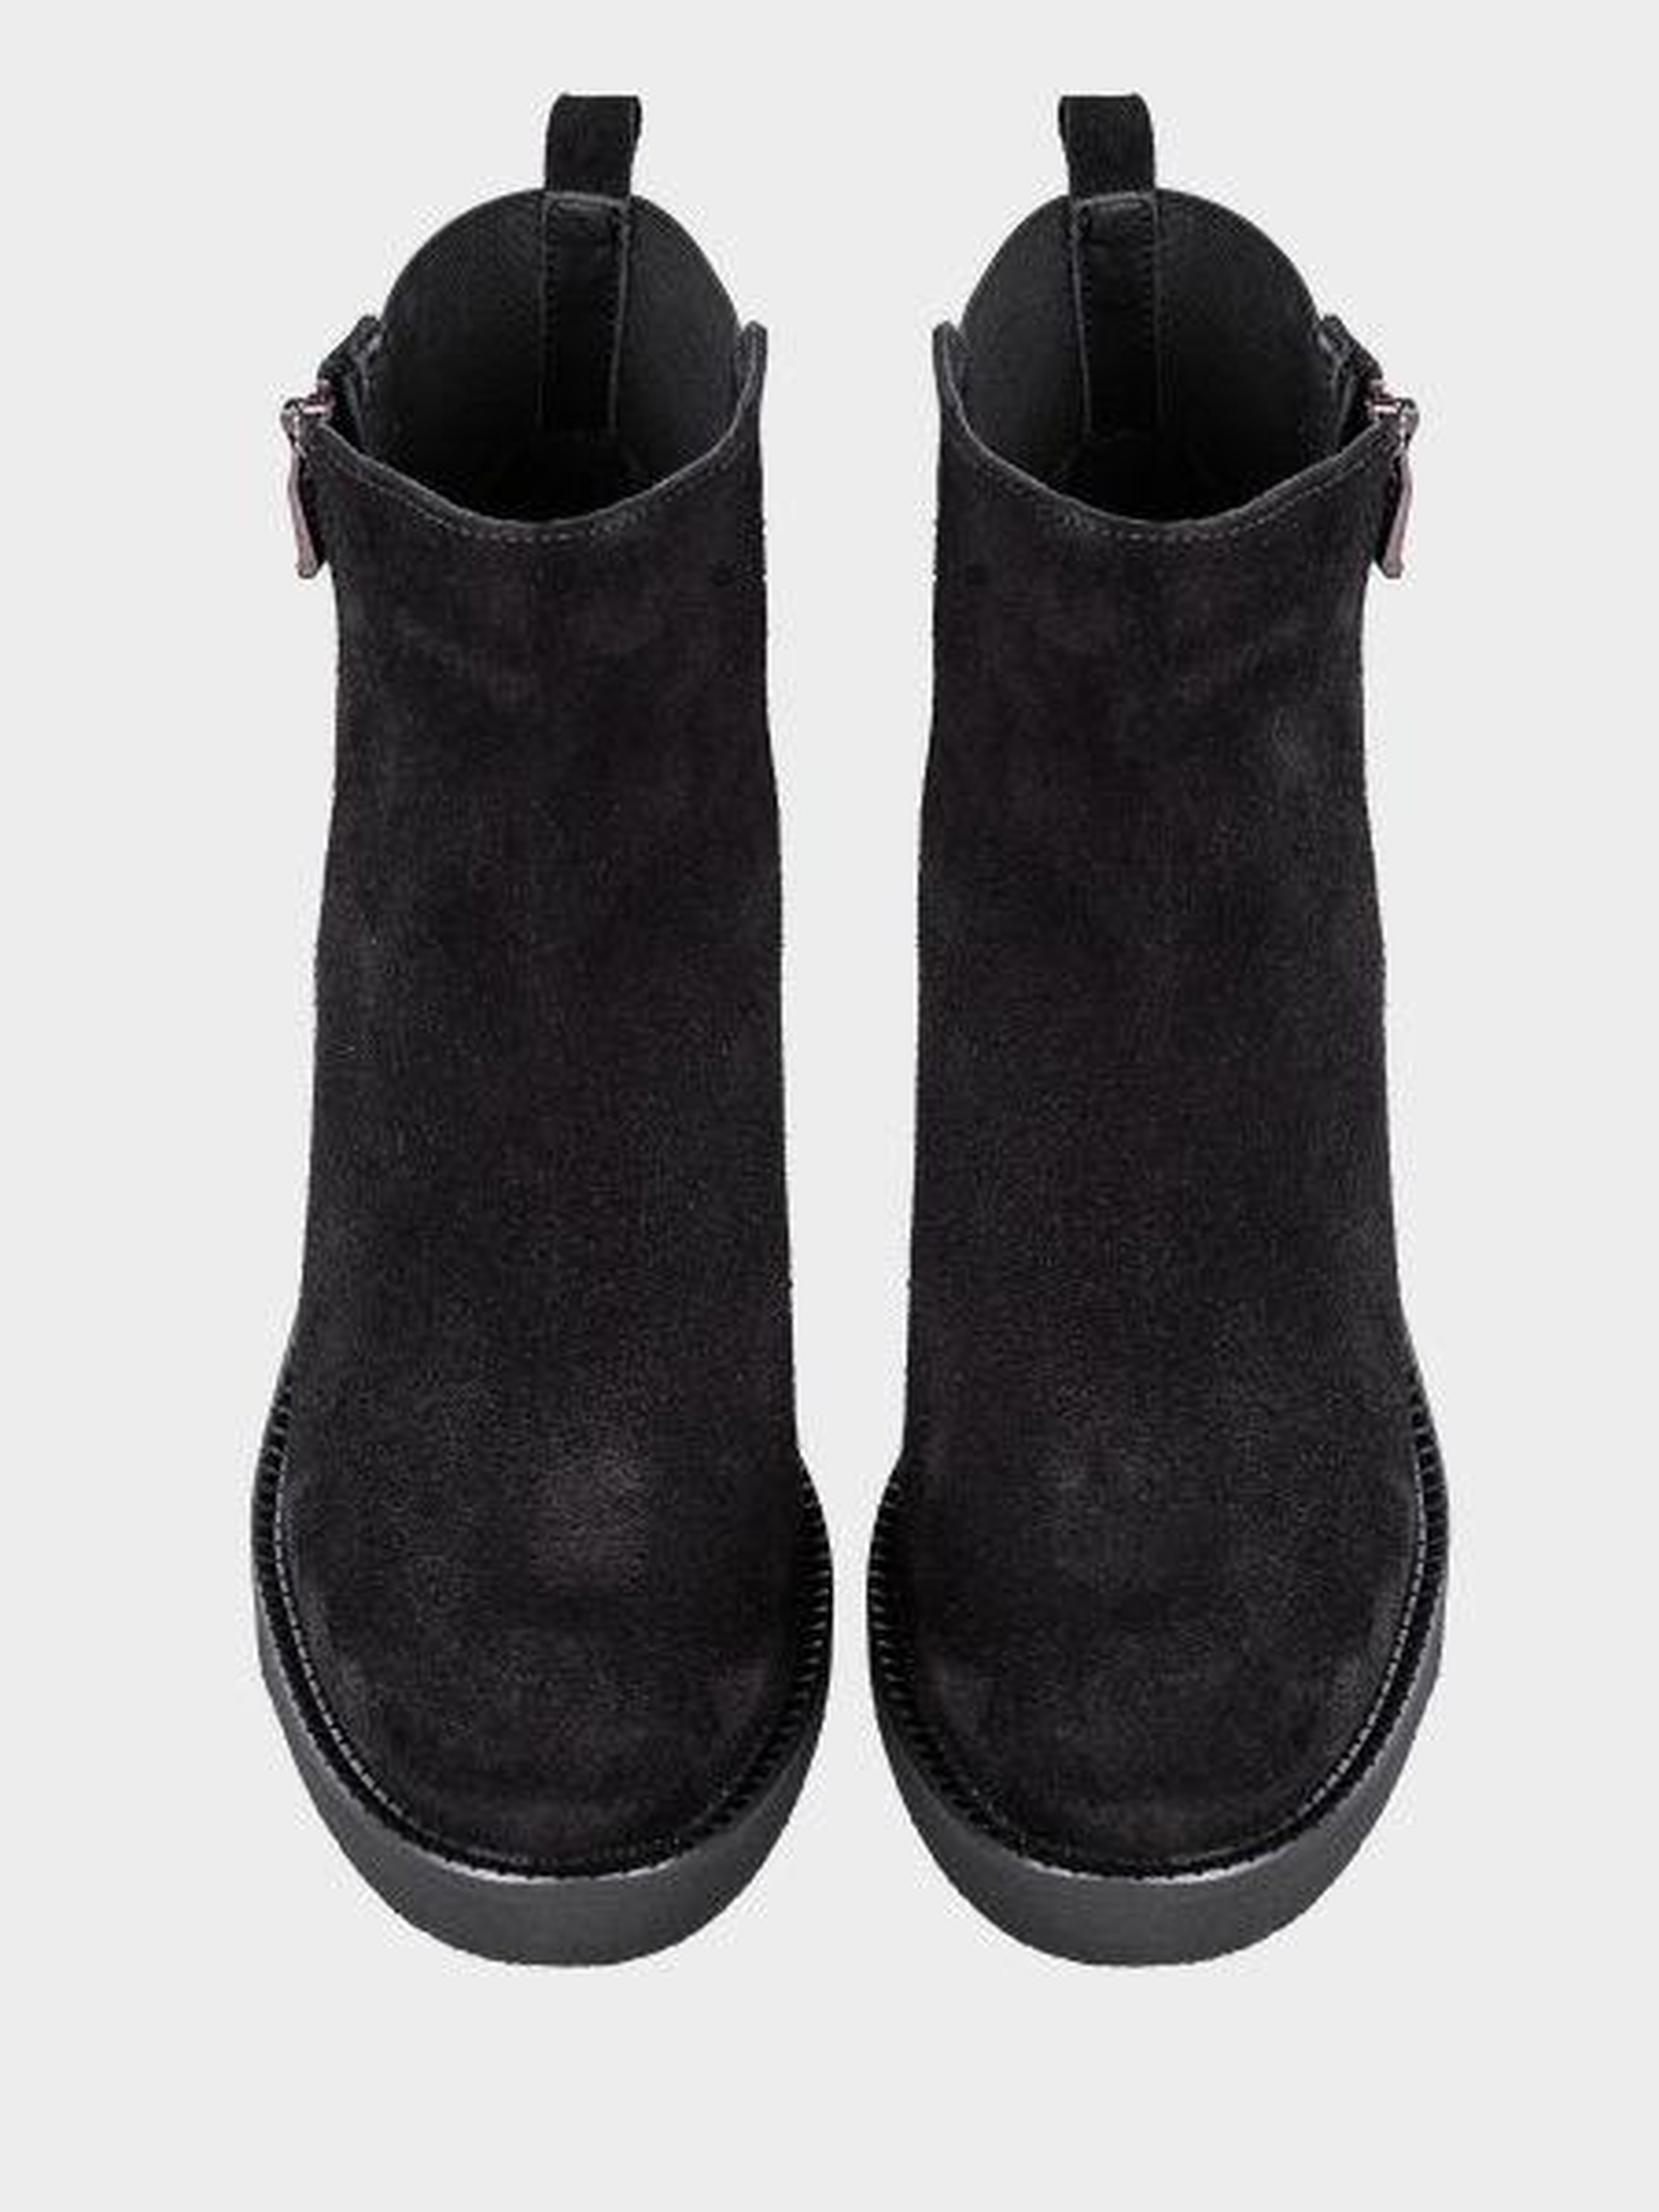 Ботинки для женщин Camalini MIU 0E7 , 2017